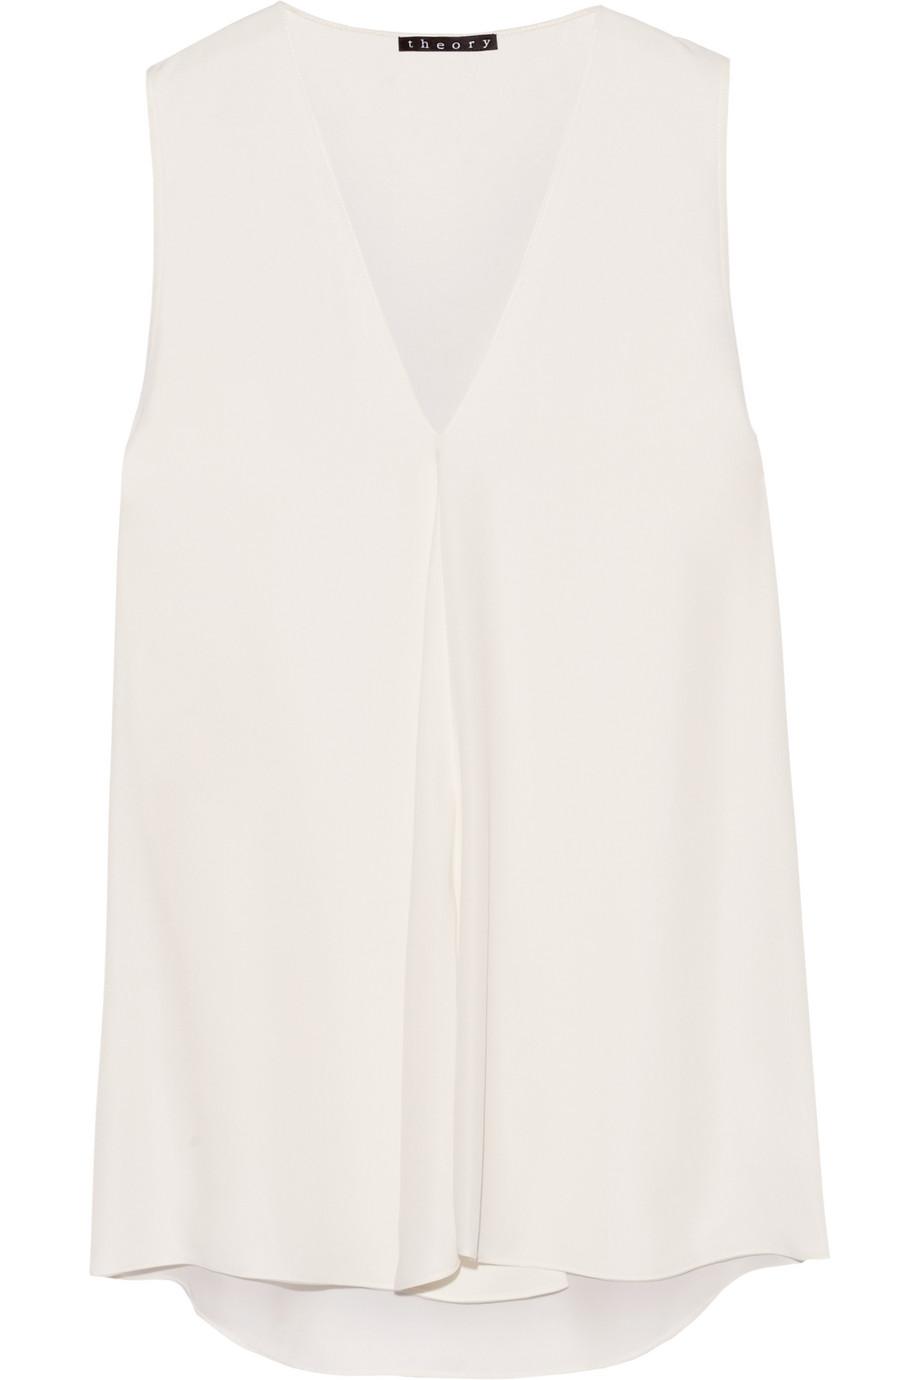 Theory Silk Blouse, Off-White, Women's